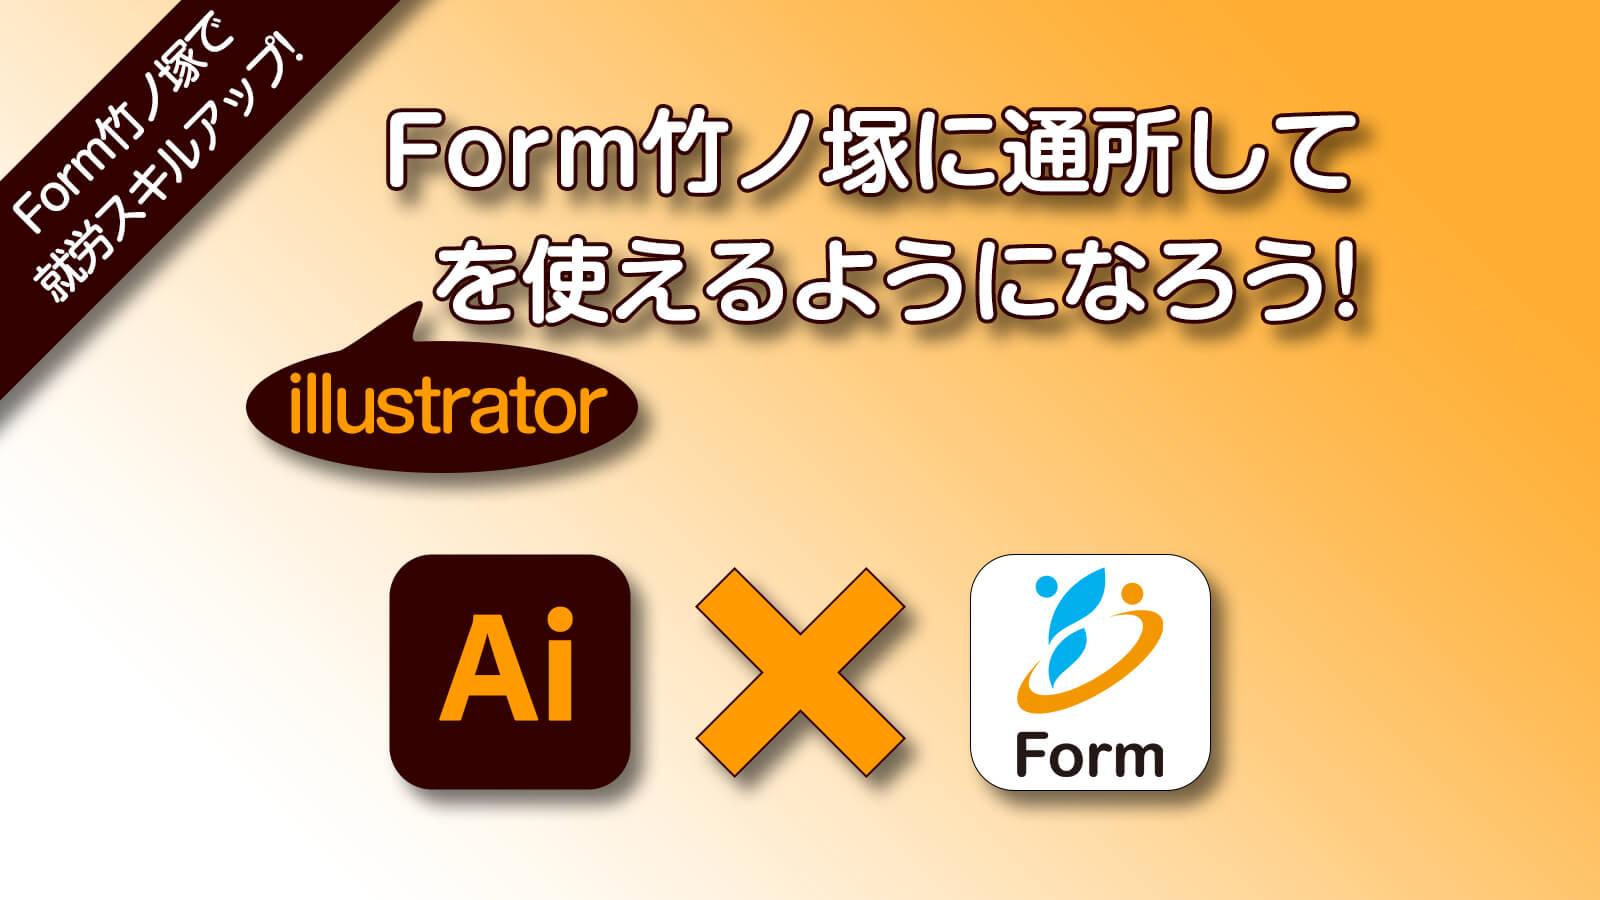 illustrator講座入門編Form竹ノ塚だけの訓練で就労スキルアップ!概要画像